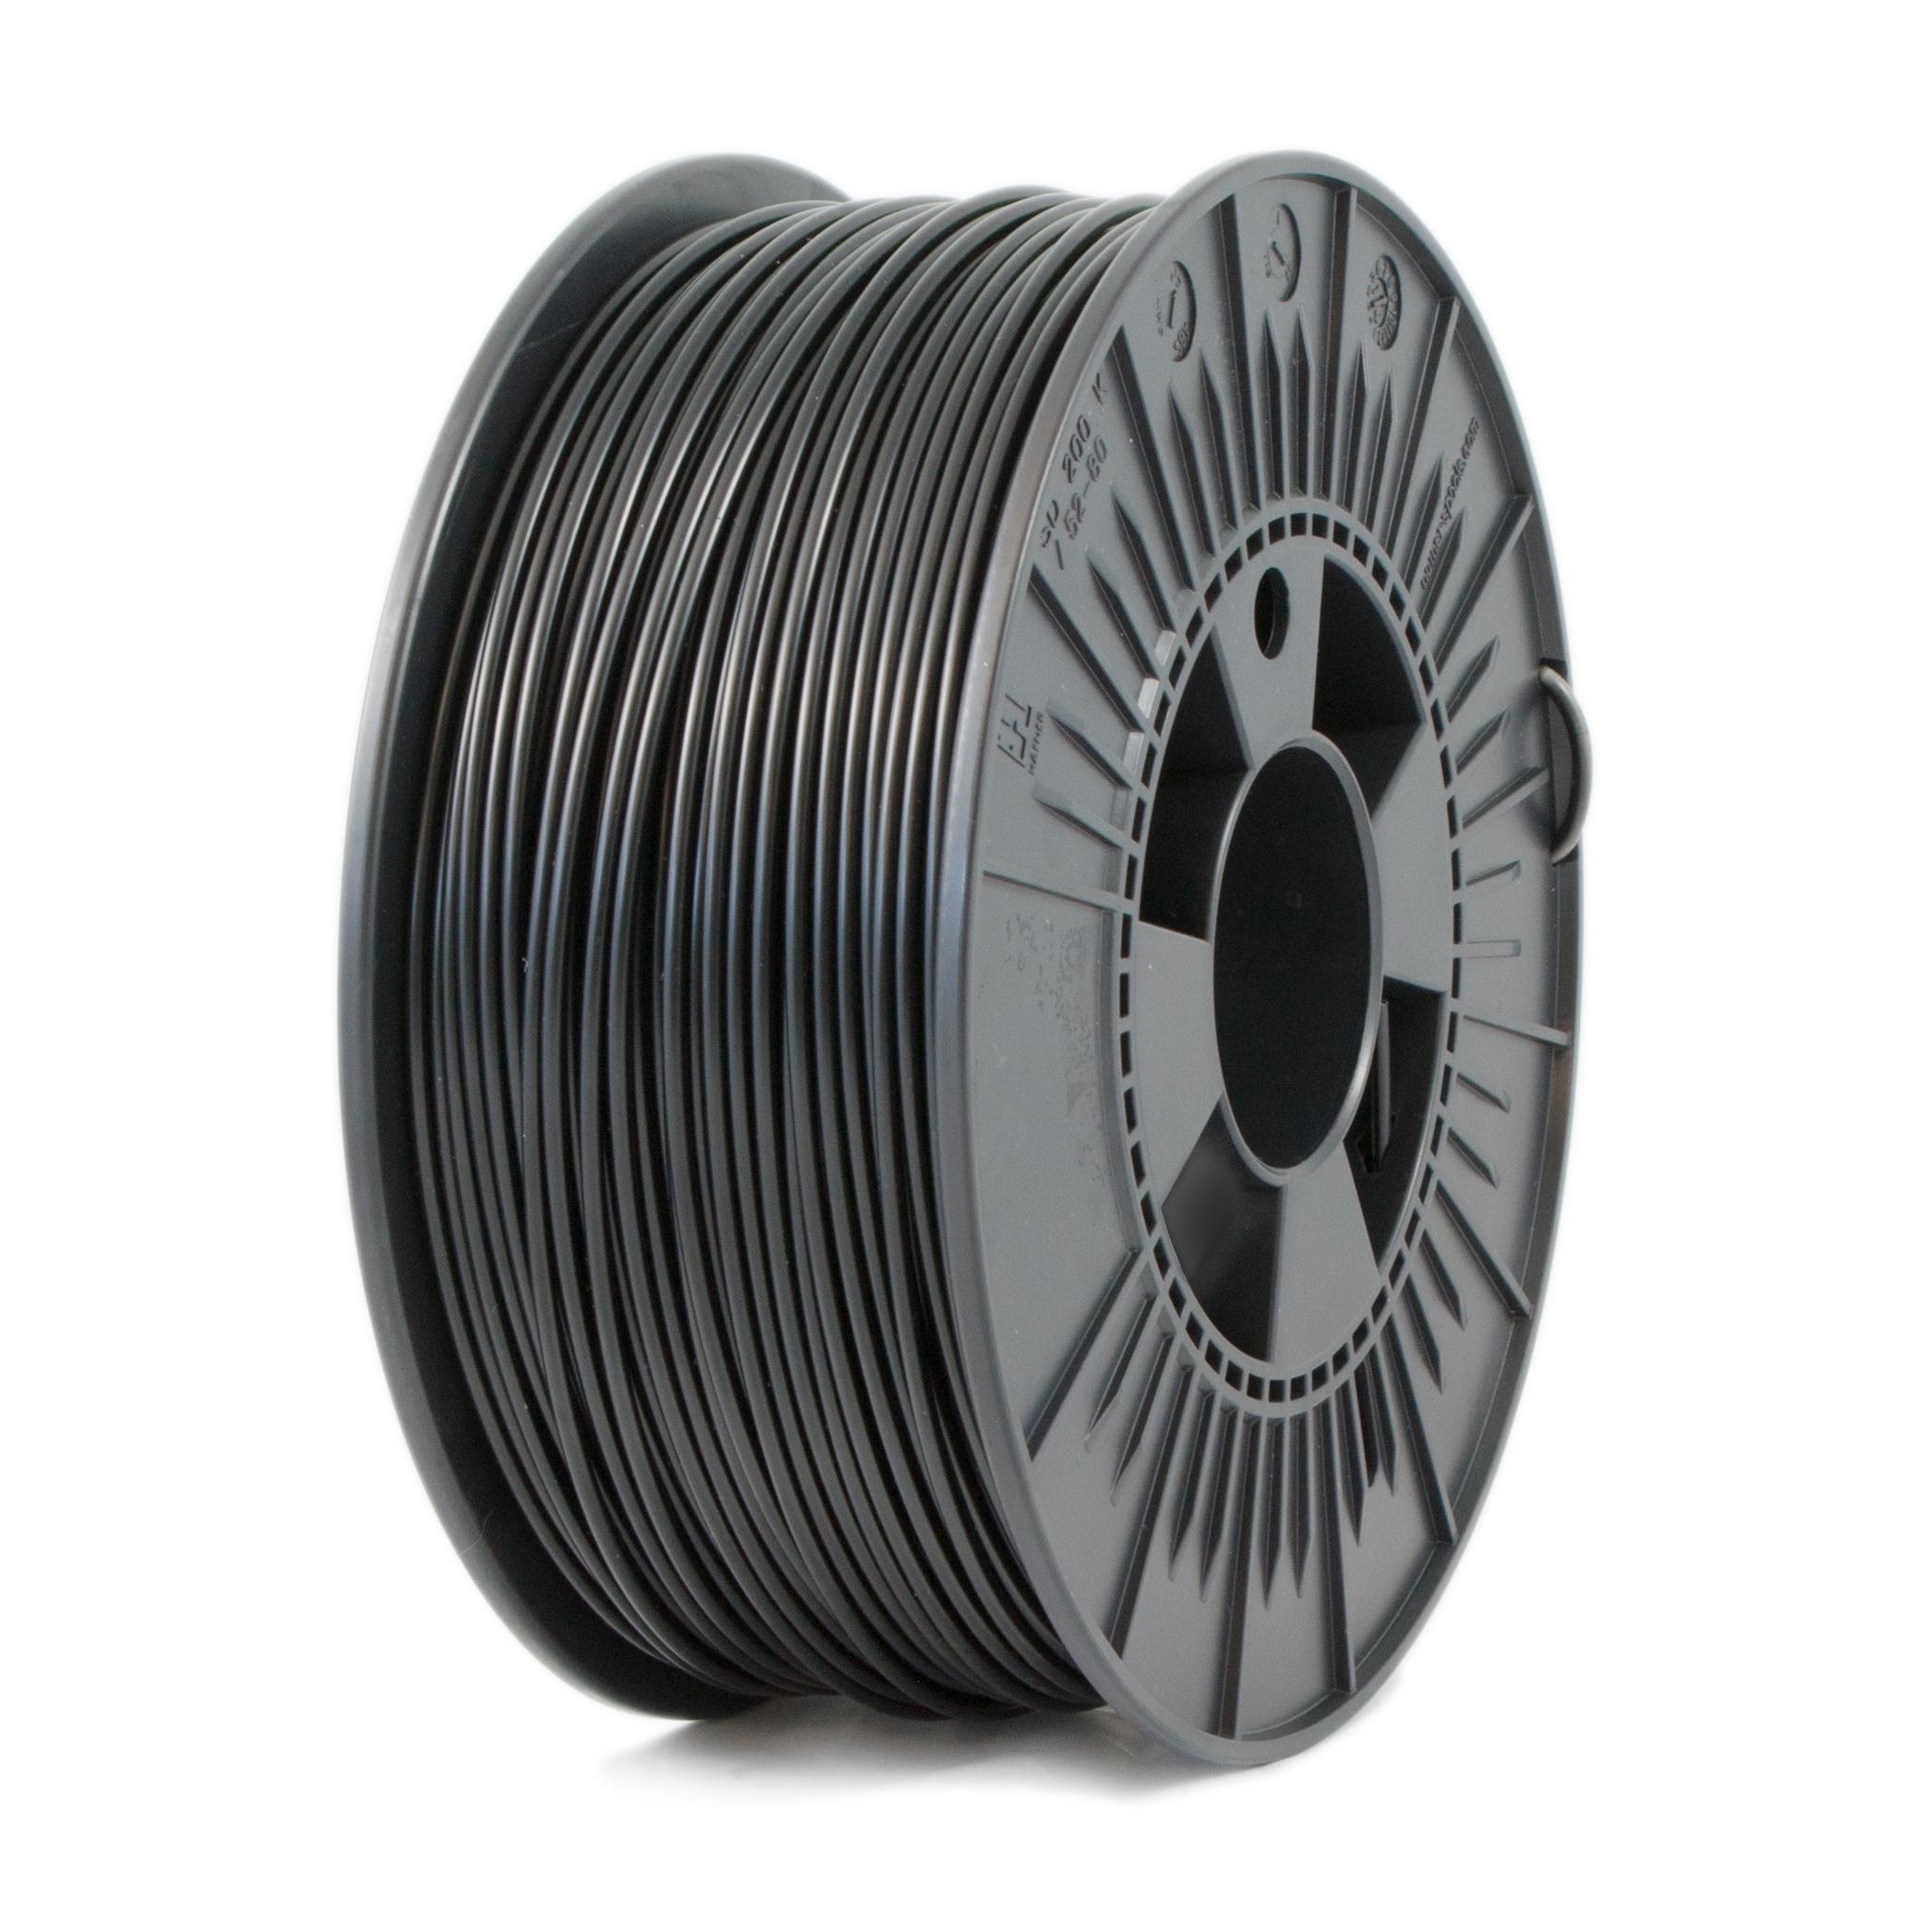 Filamentive  Black PLA 1.75 mm